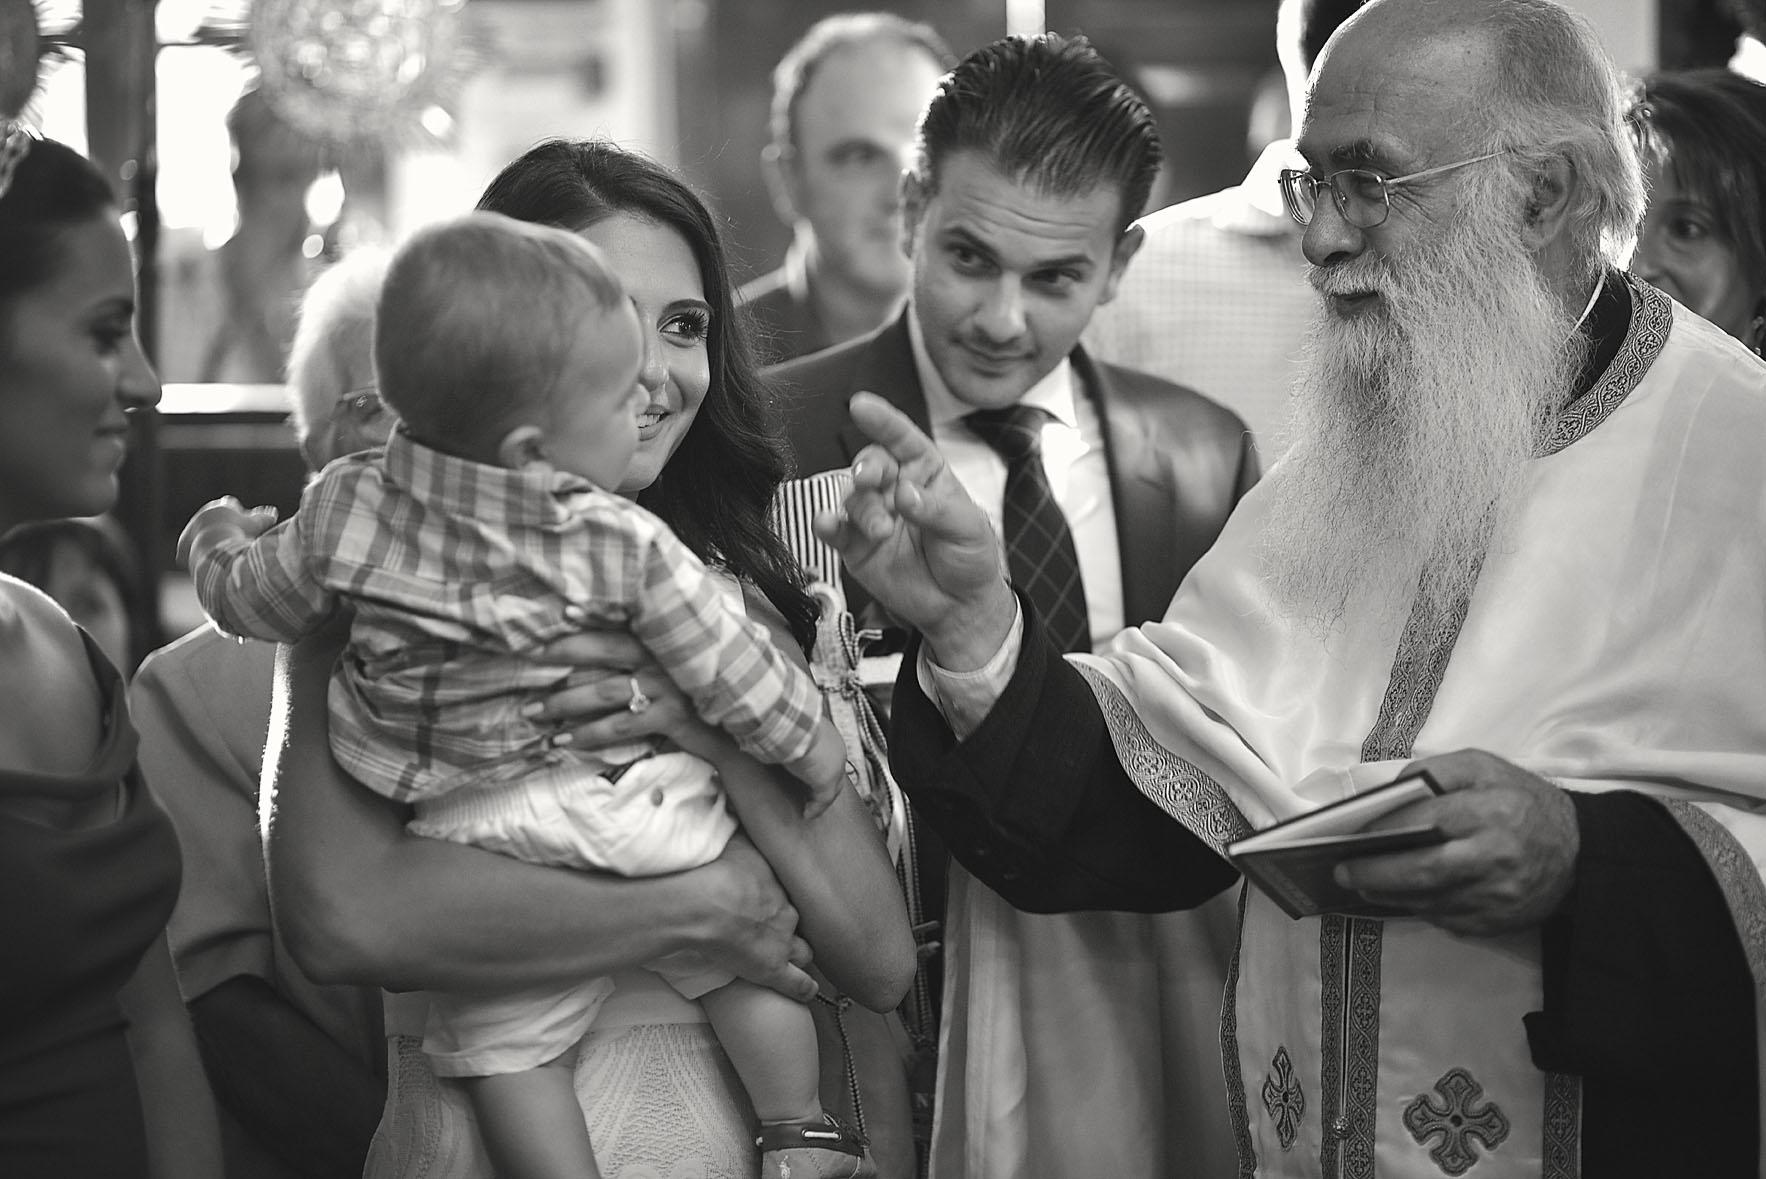 panagia-siriotissa-kampos-chios-christening-baptism-alexis-koumaditis-photography-17